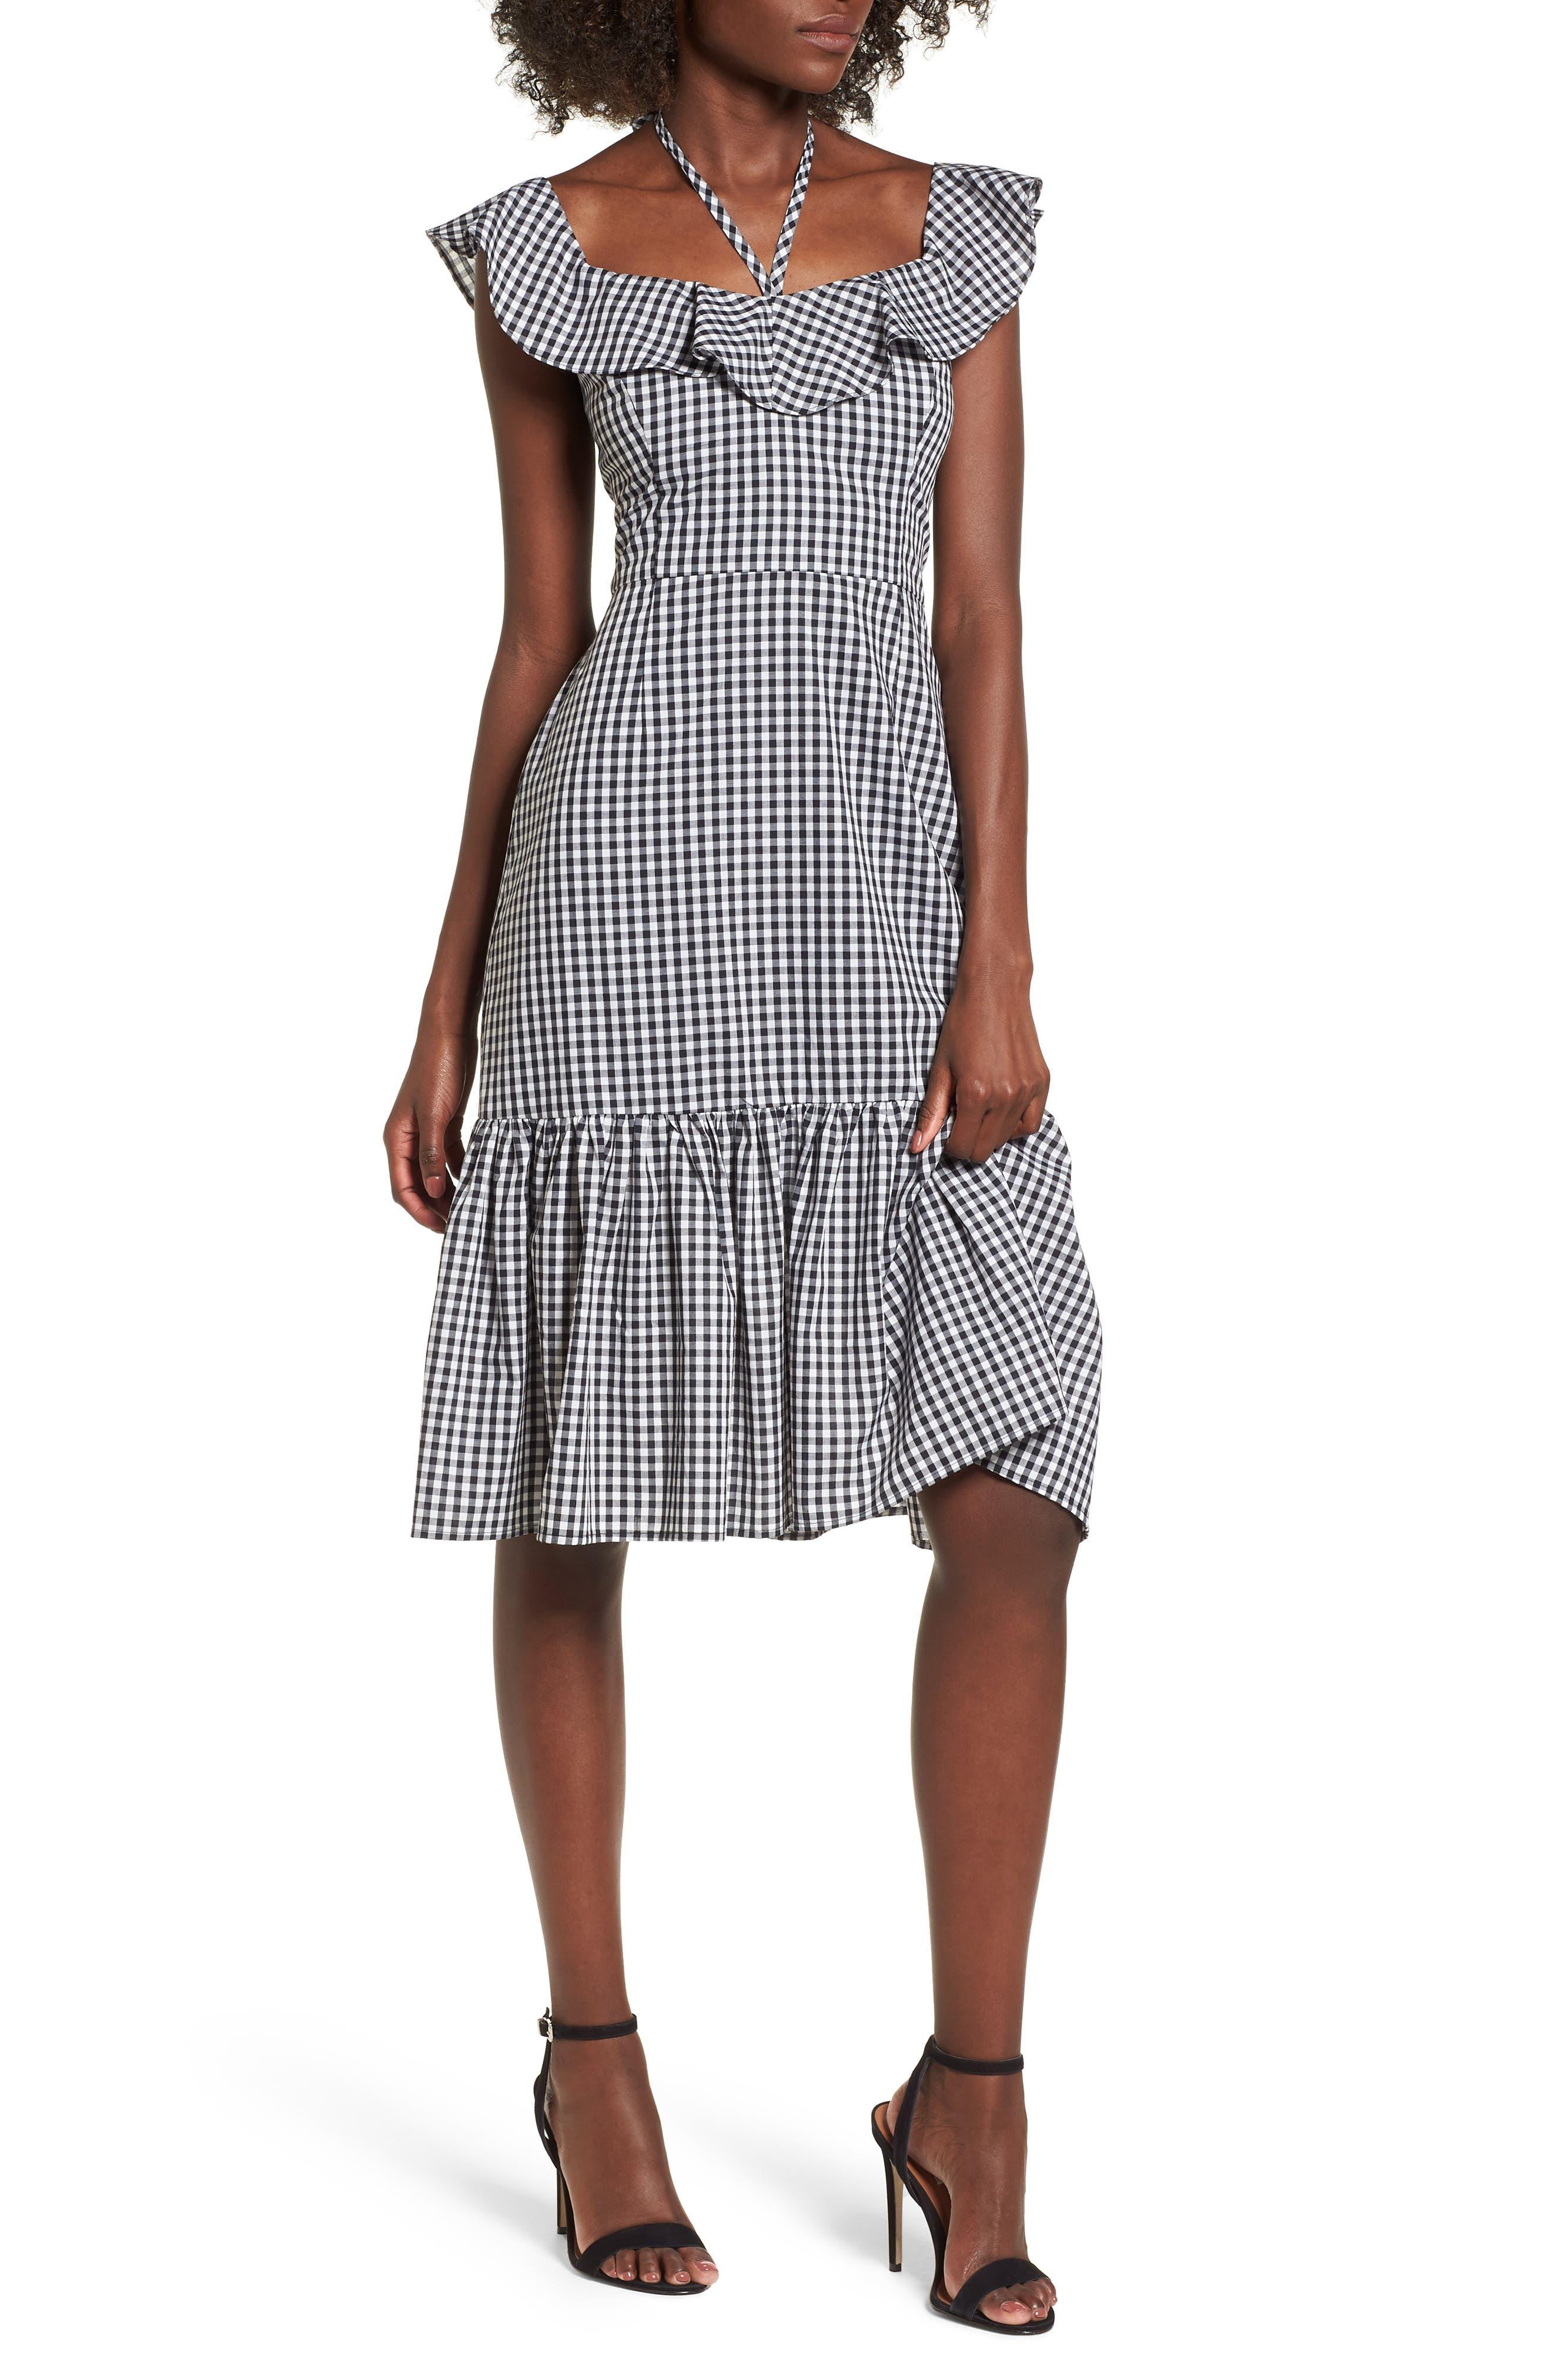 Zander Ruffle Midi Dress,                         Main,                         color, Black Gingham